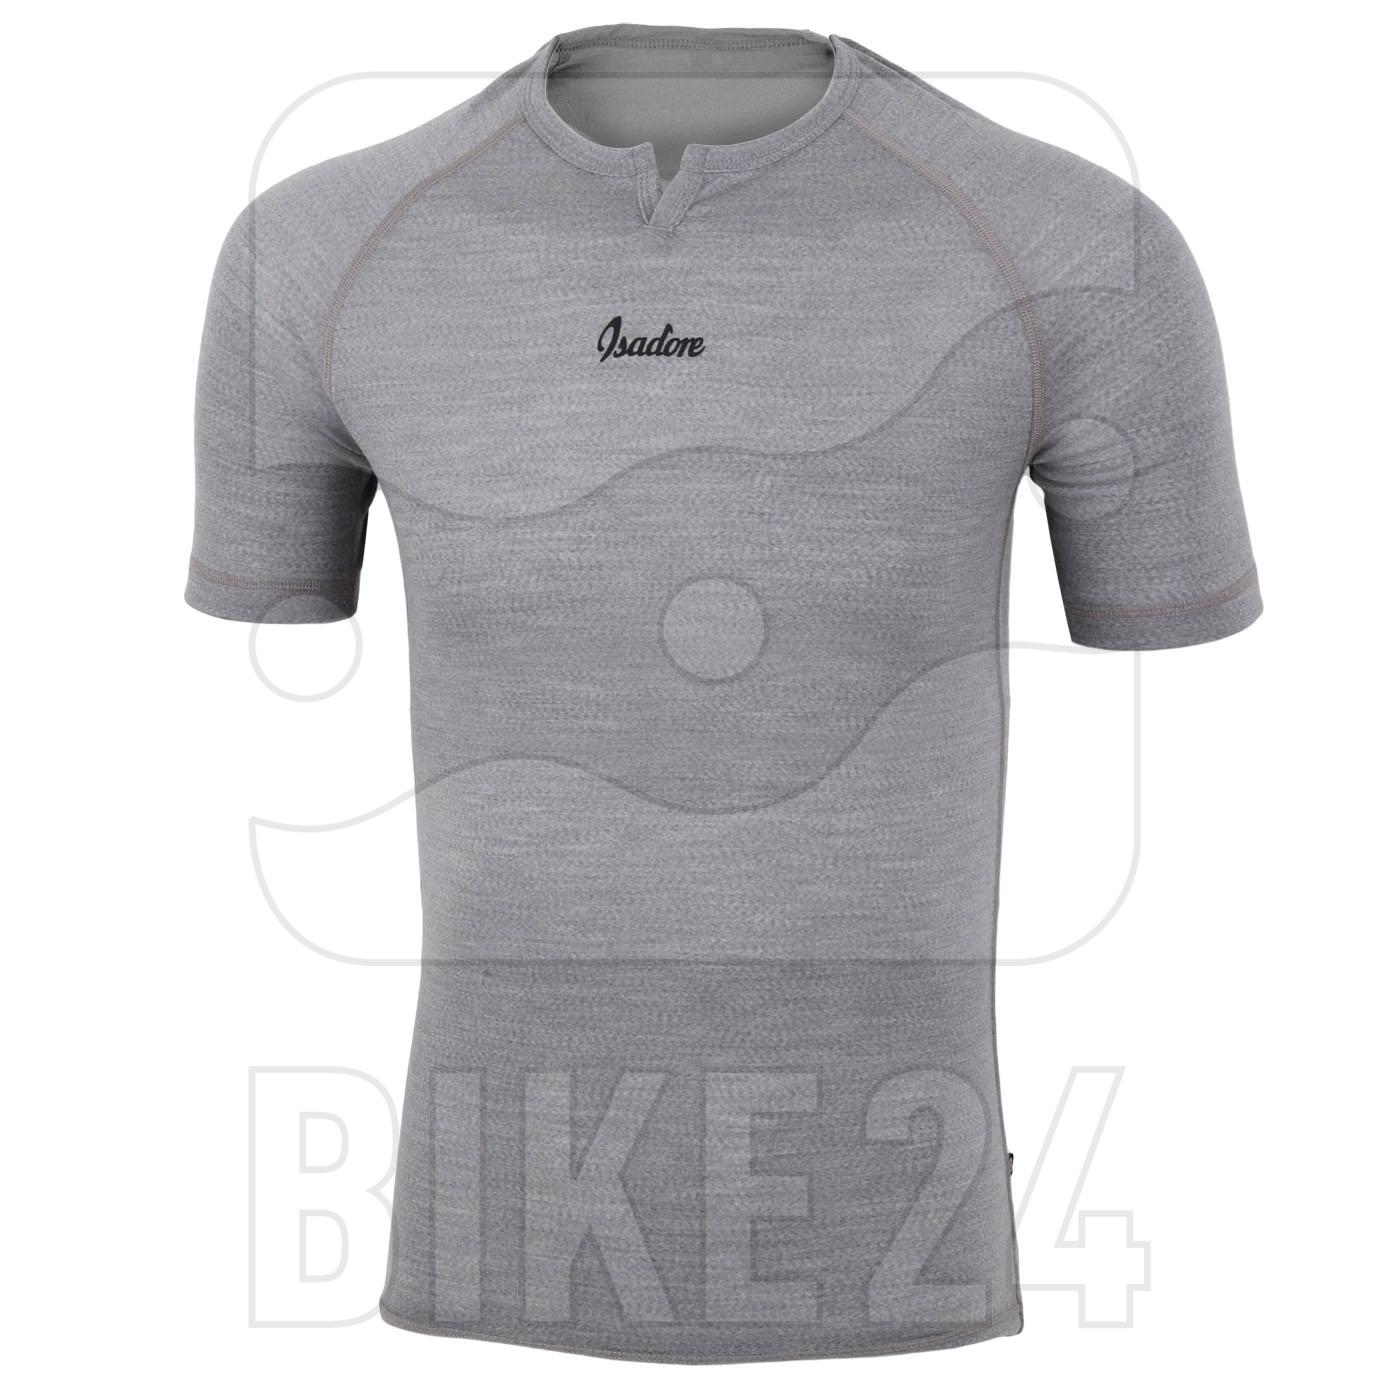 Isadore 100% Merino Short Sleeve Baselayer - Grey